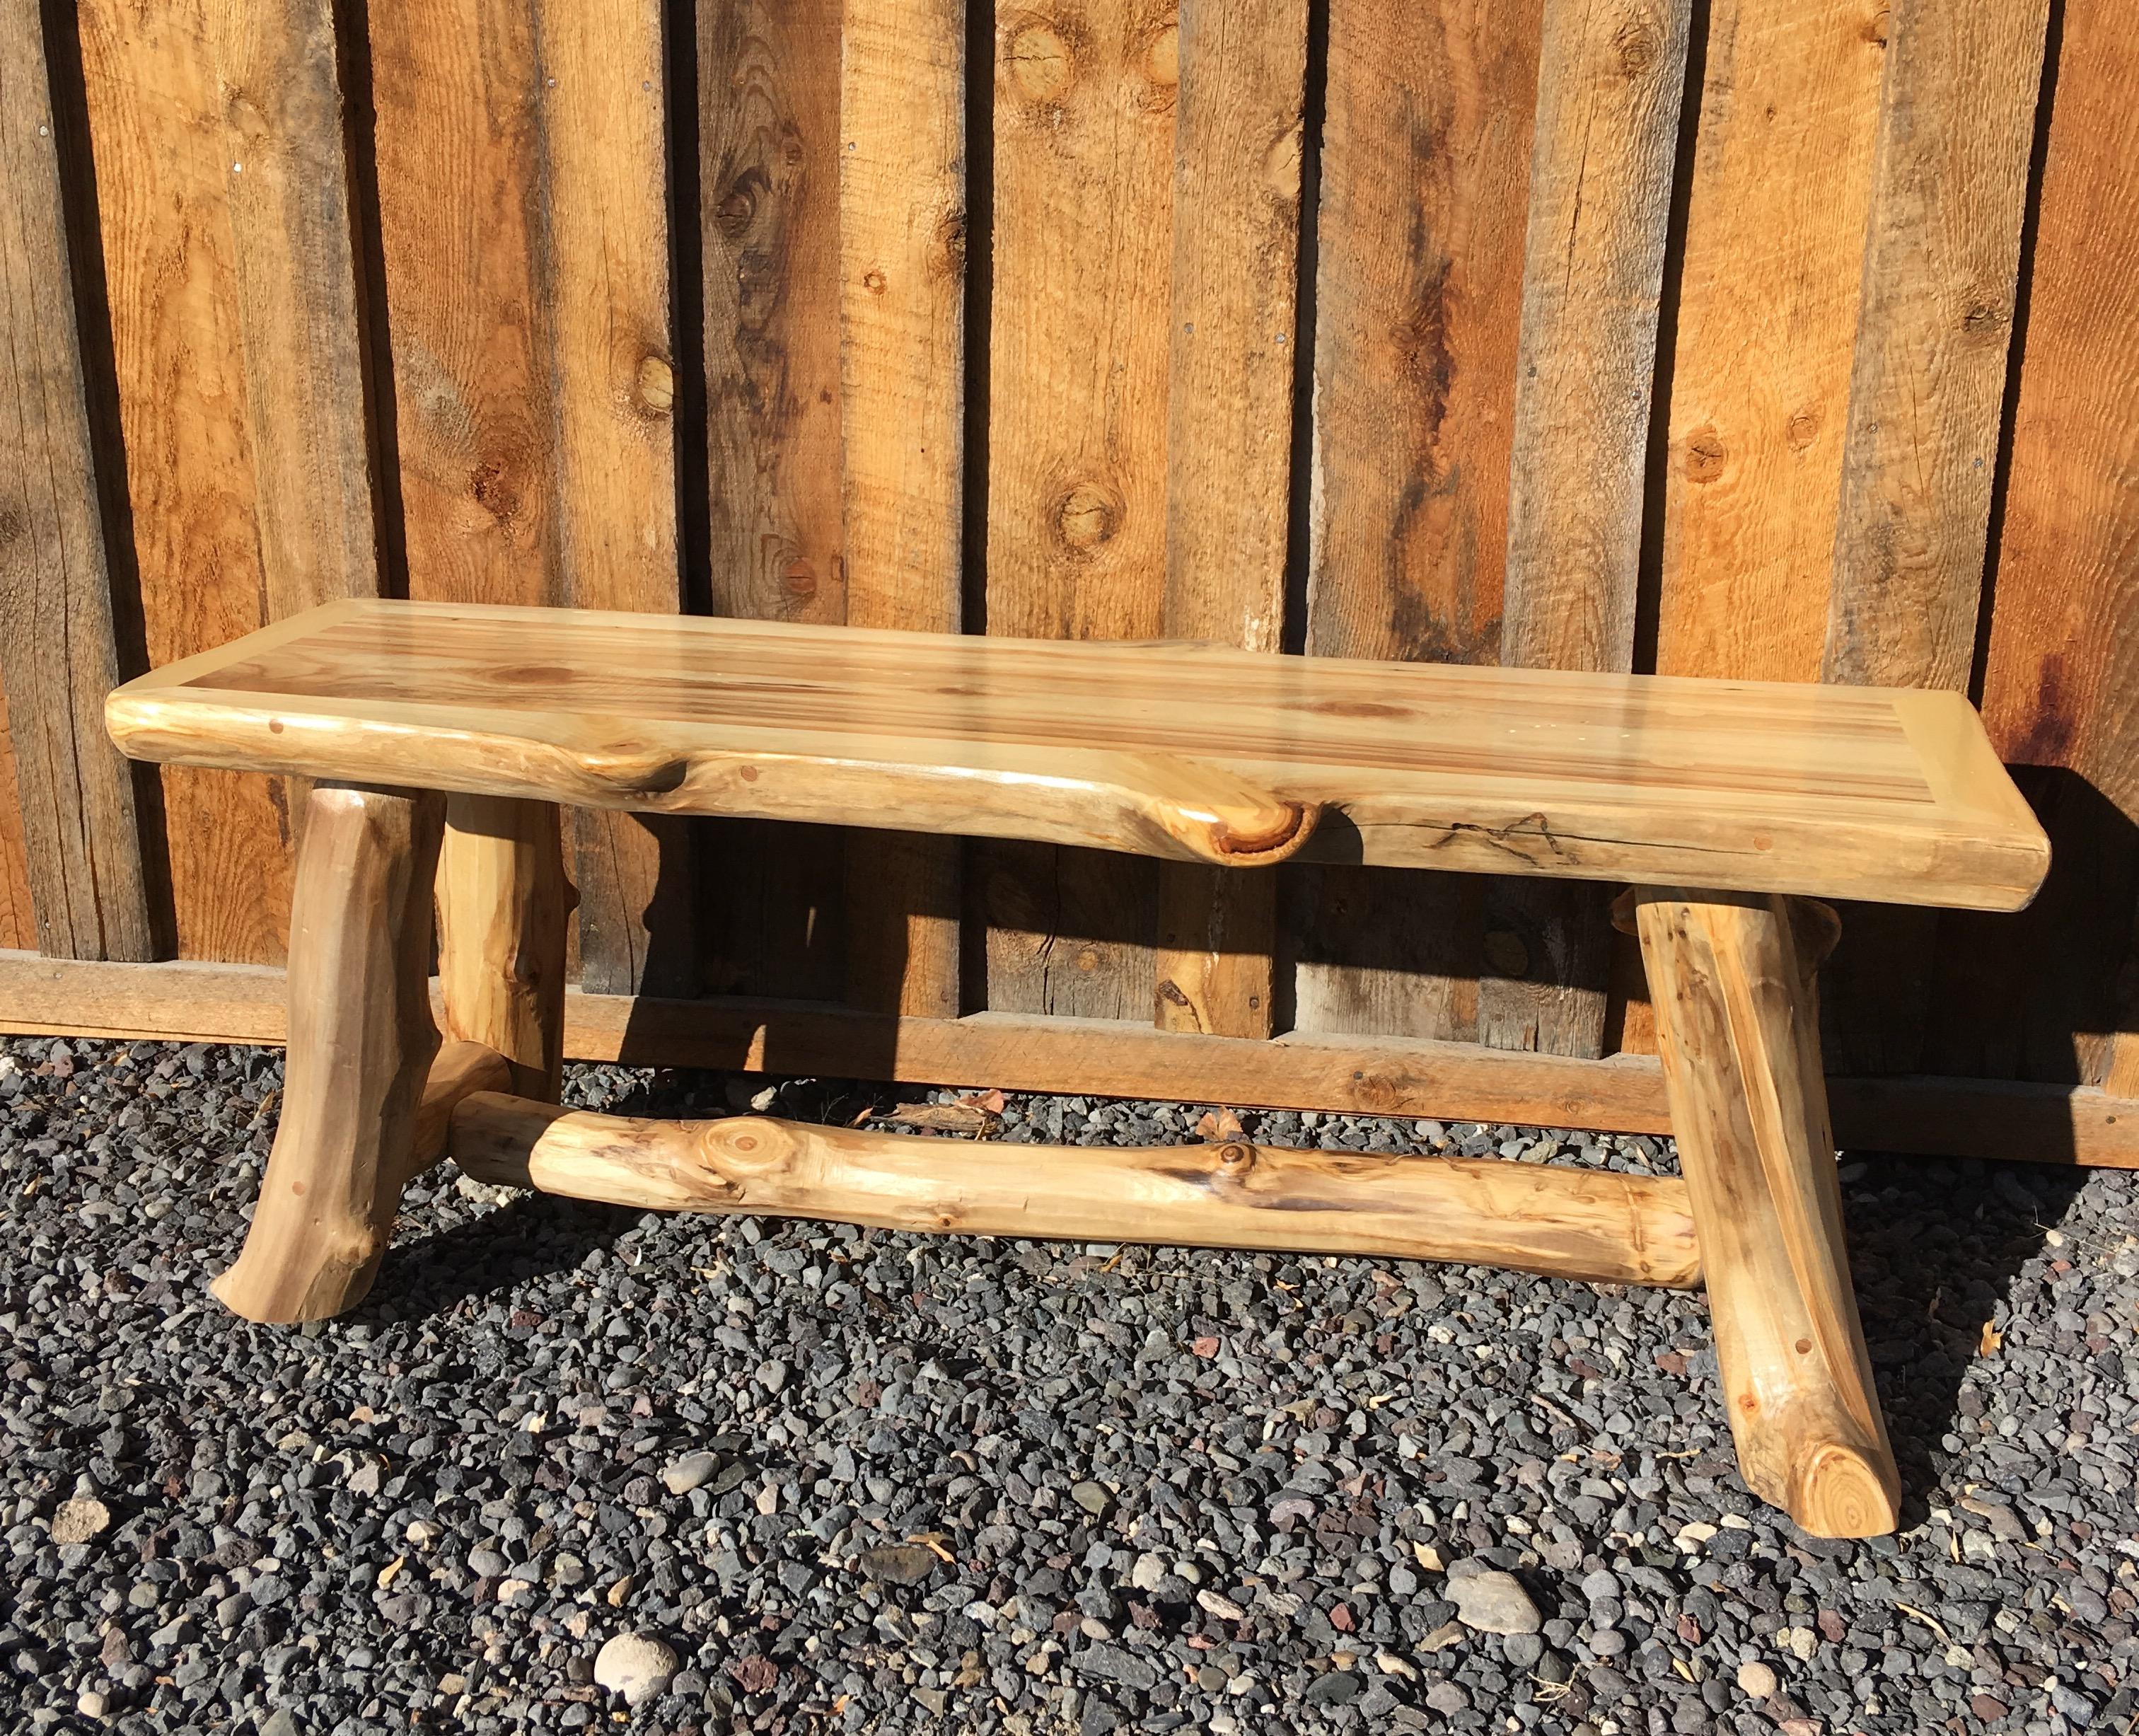 4 ft. bench